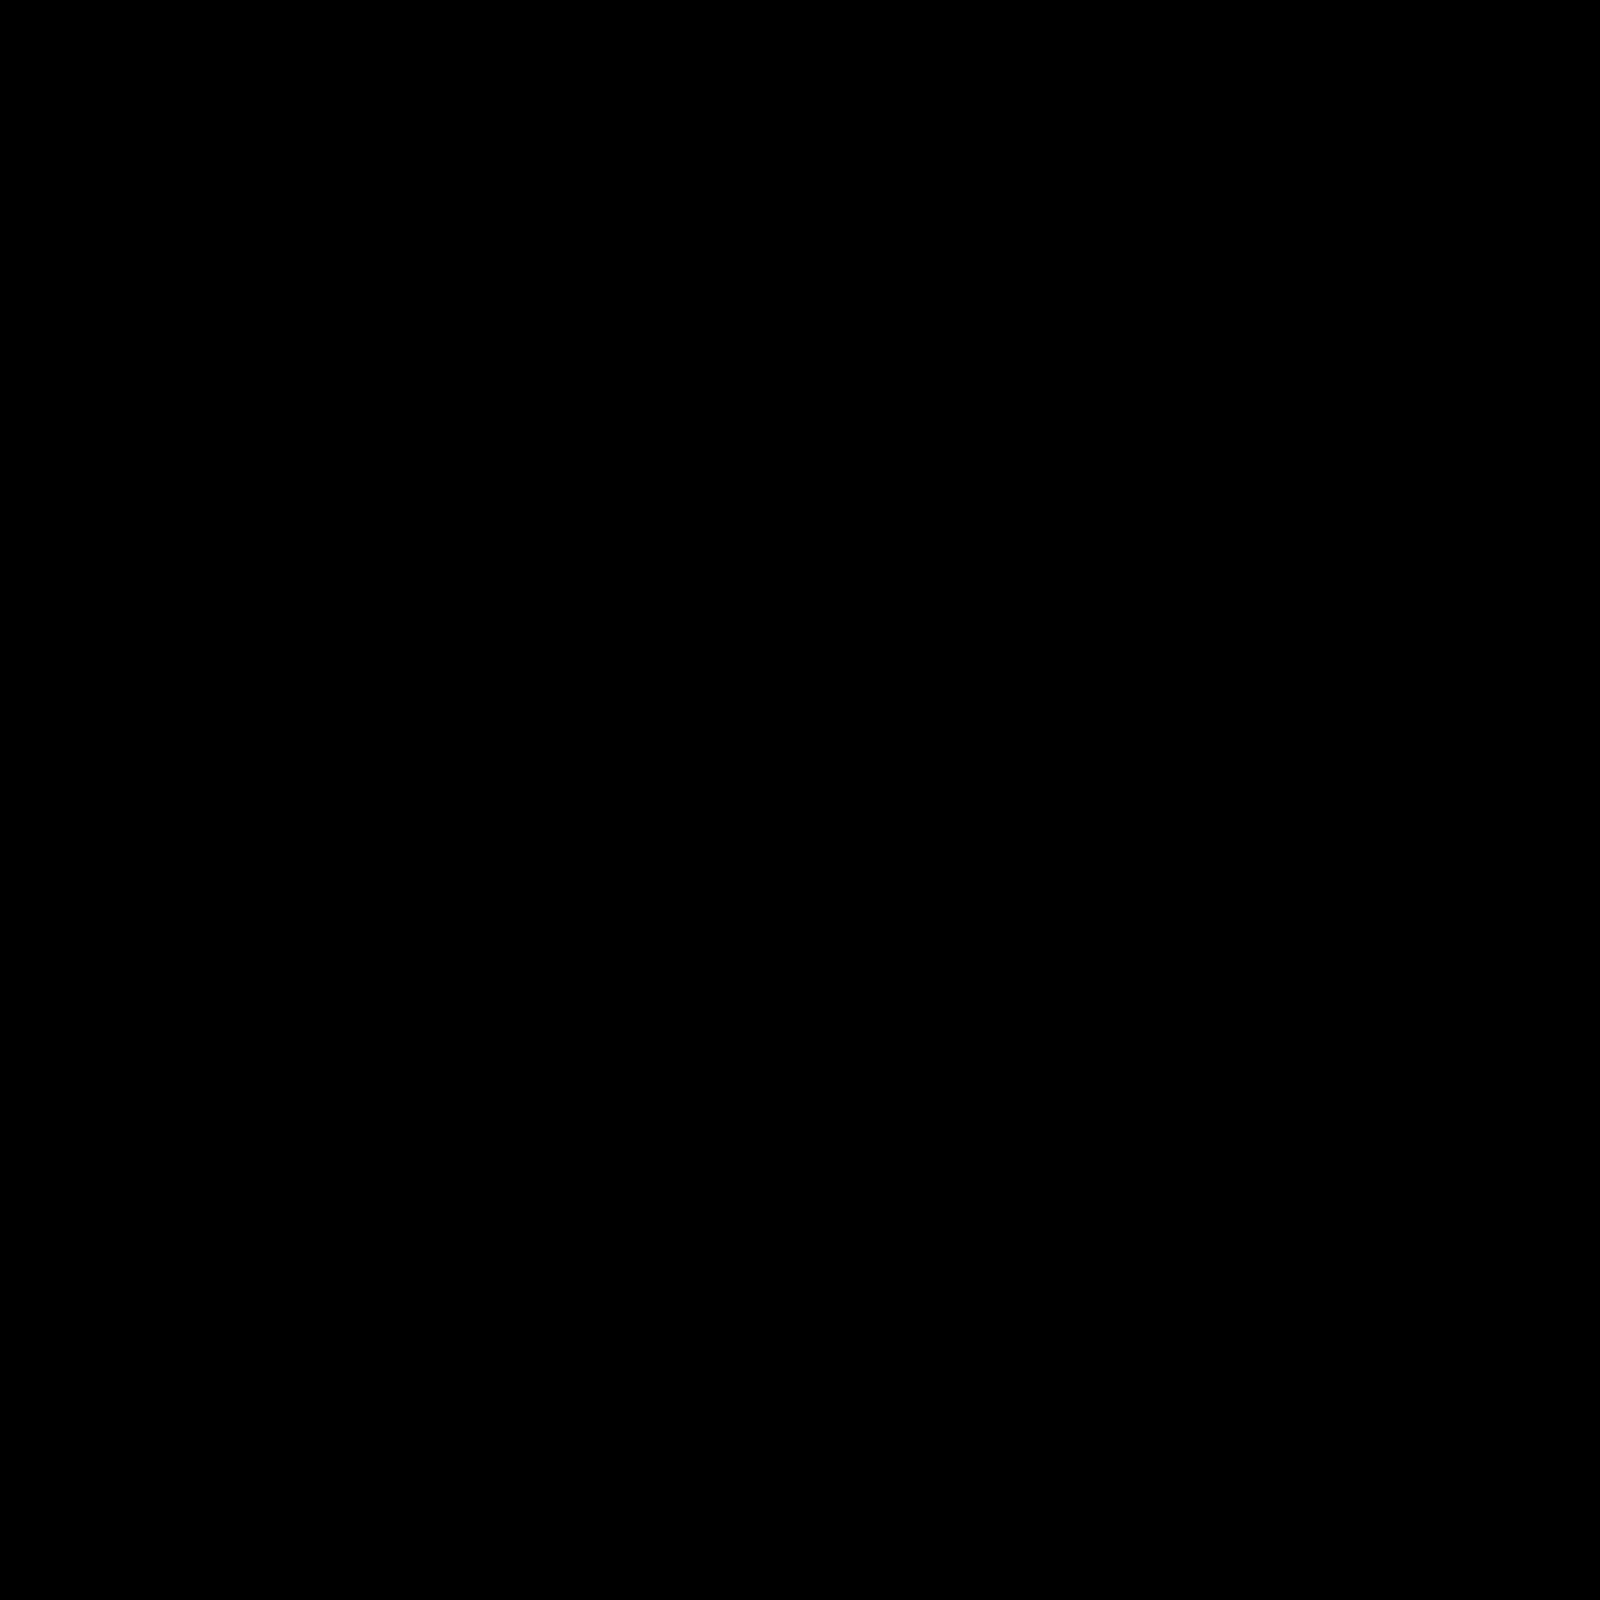 Select Row icon